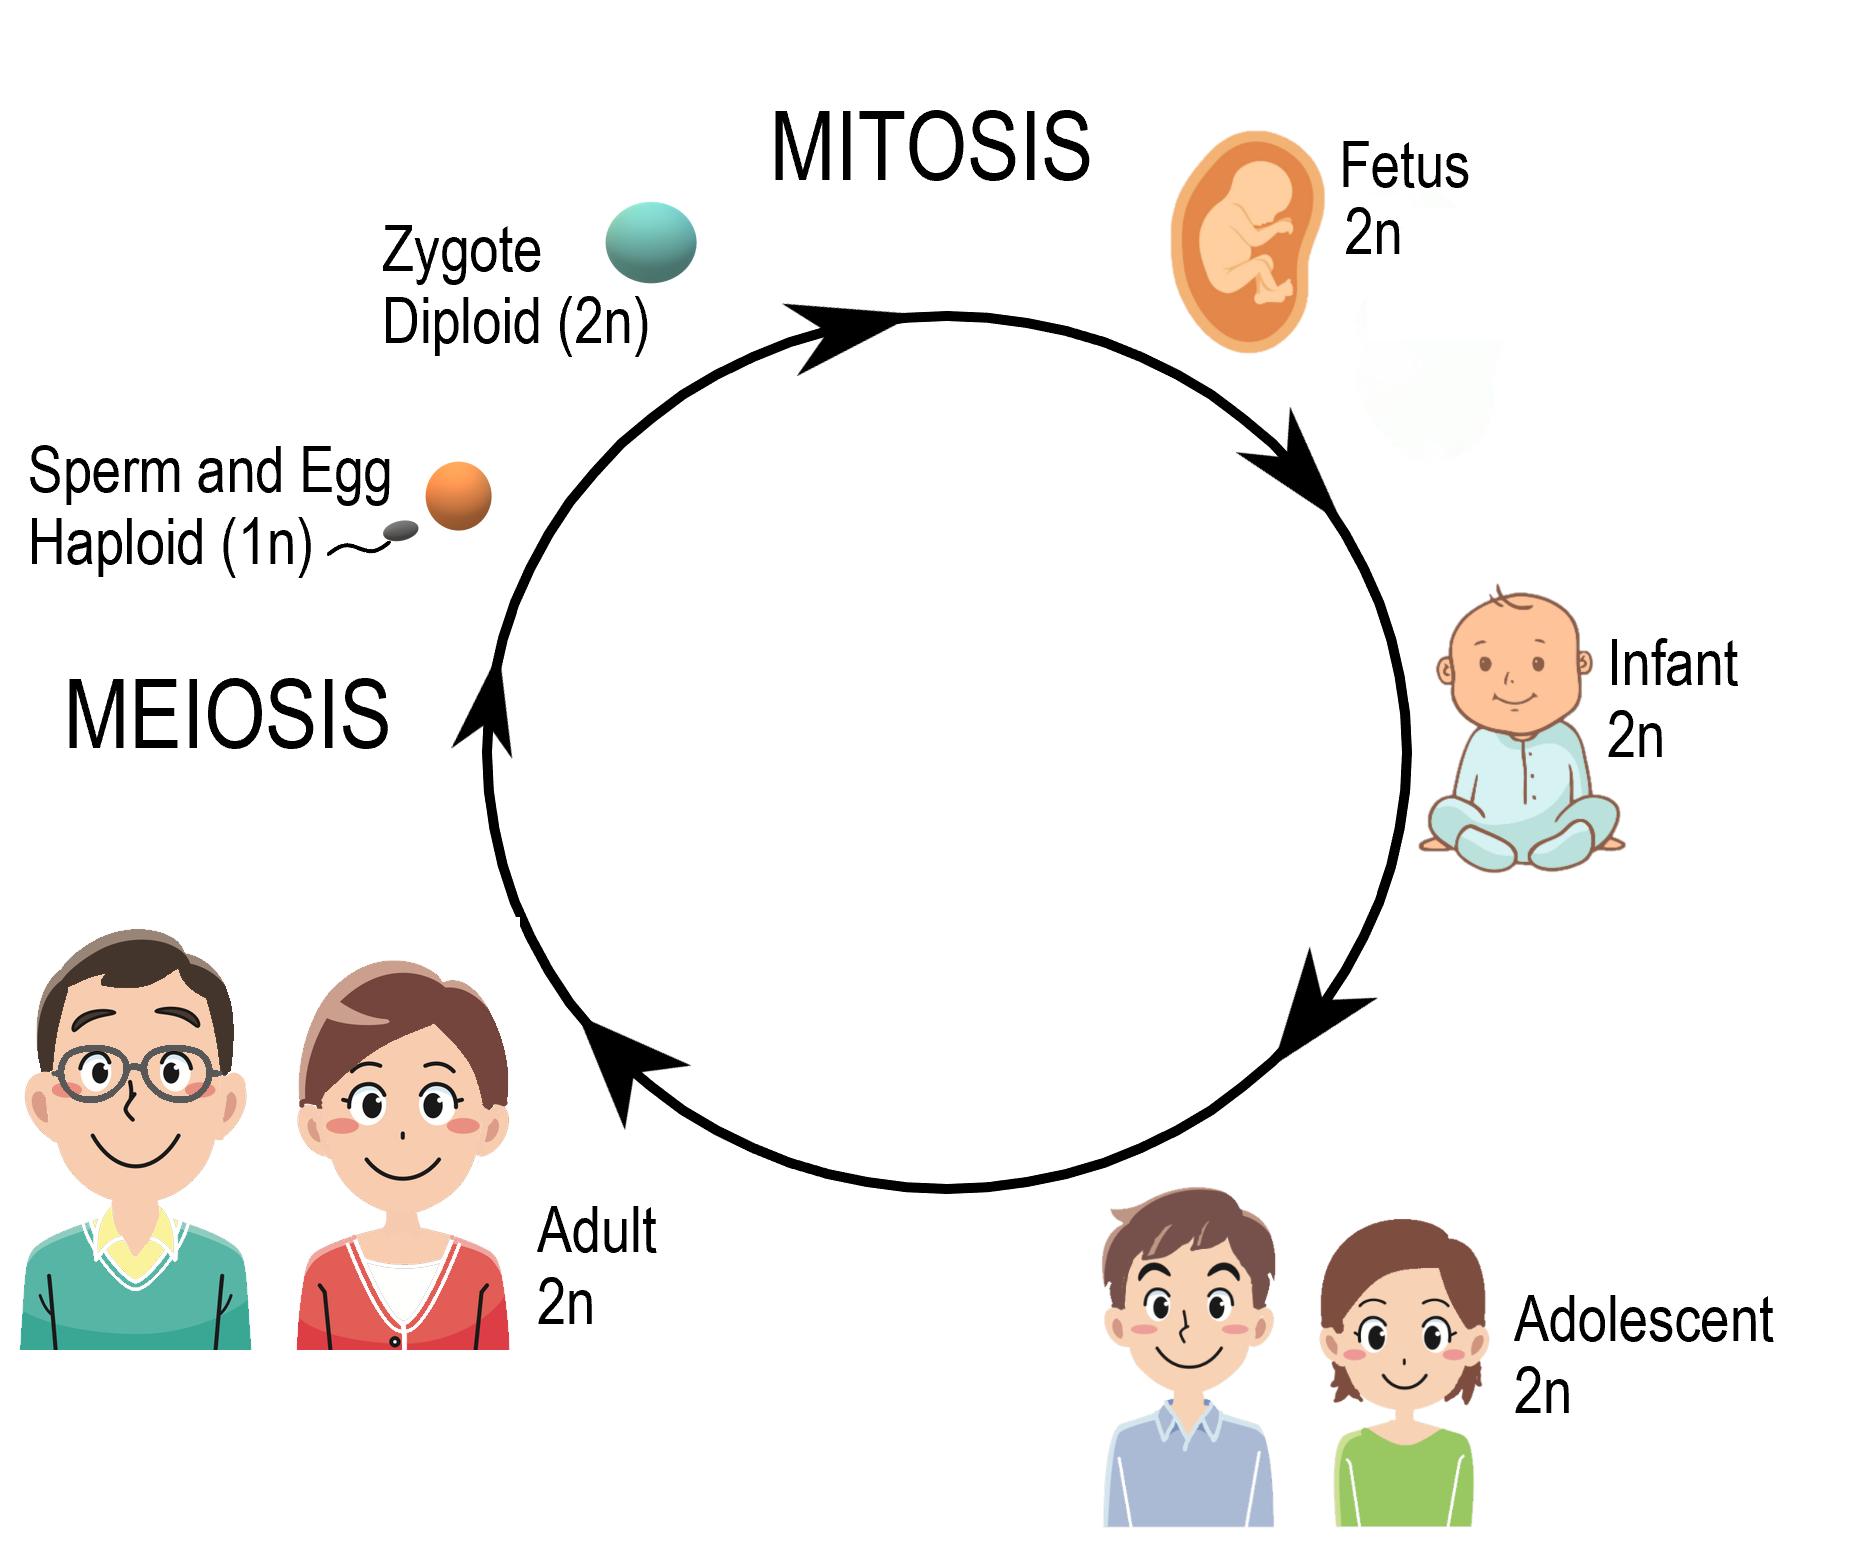 Image illustrates the human life cycle